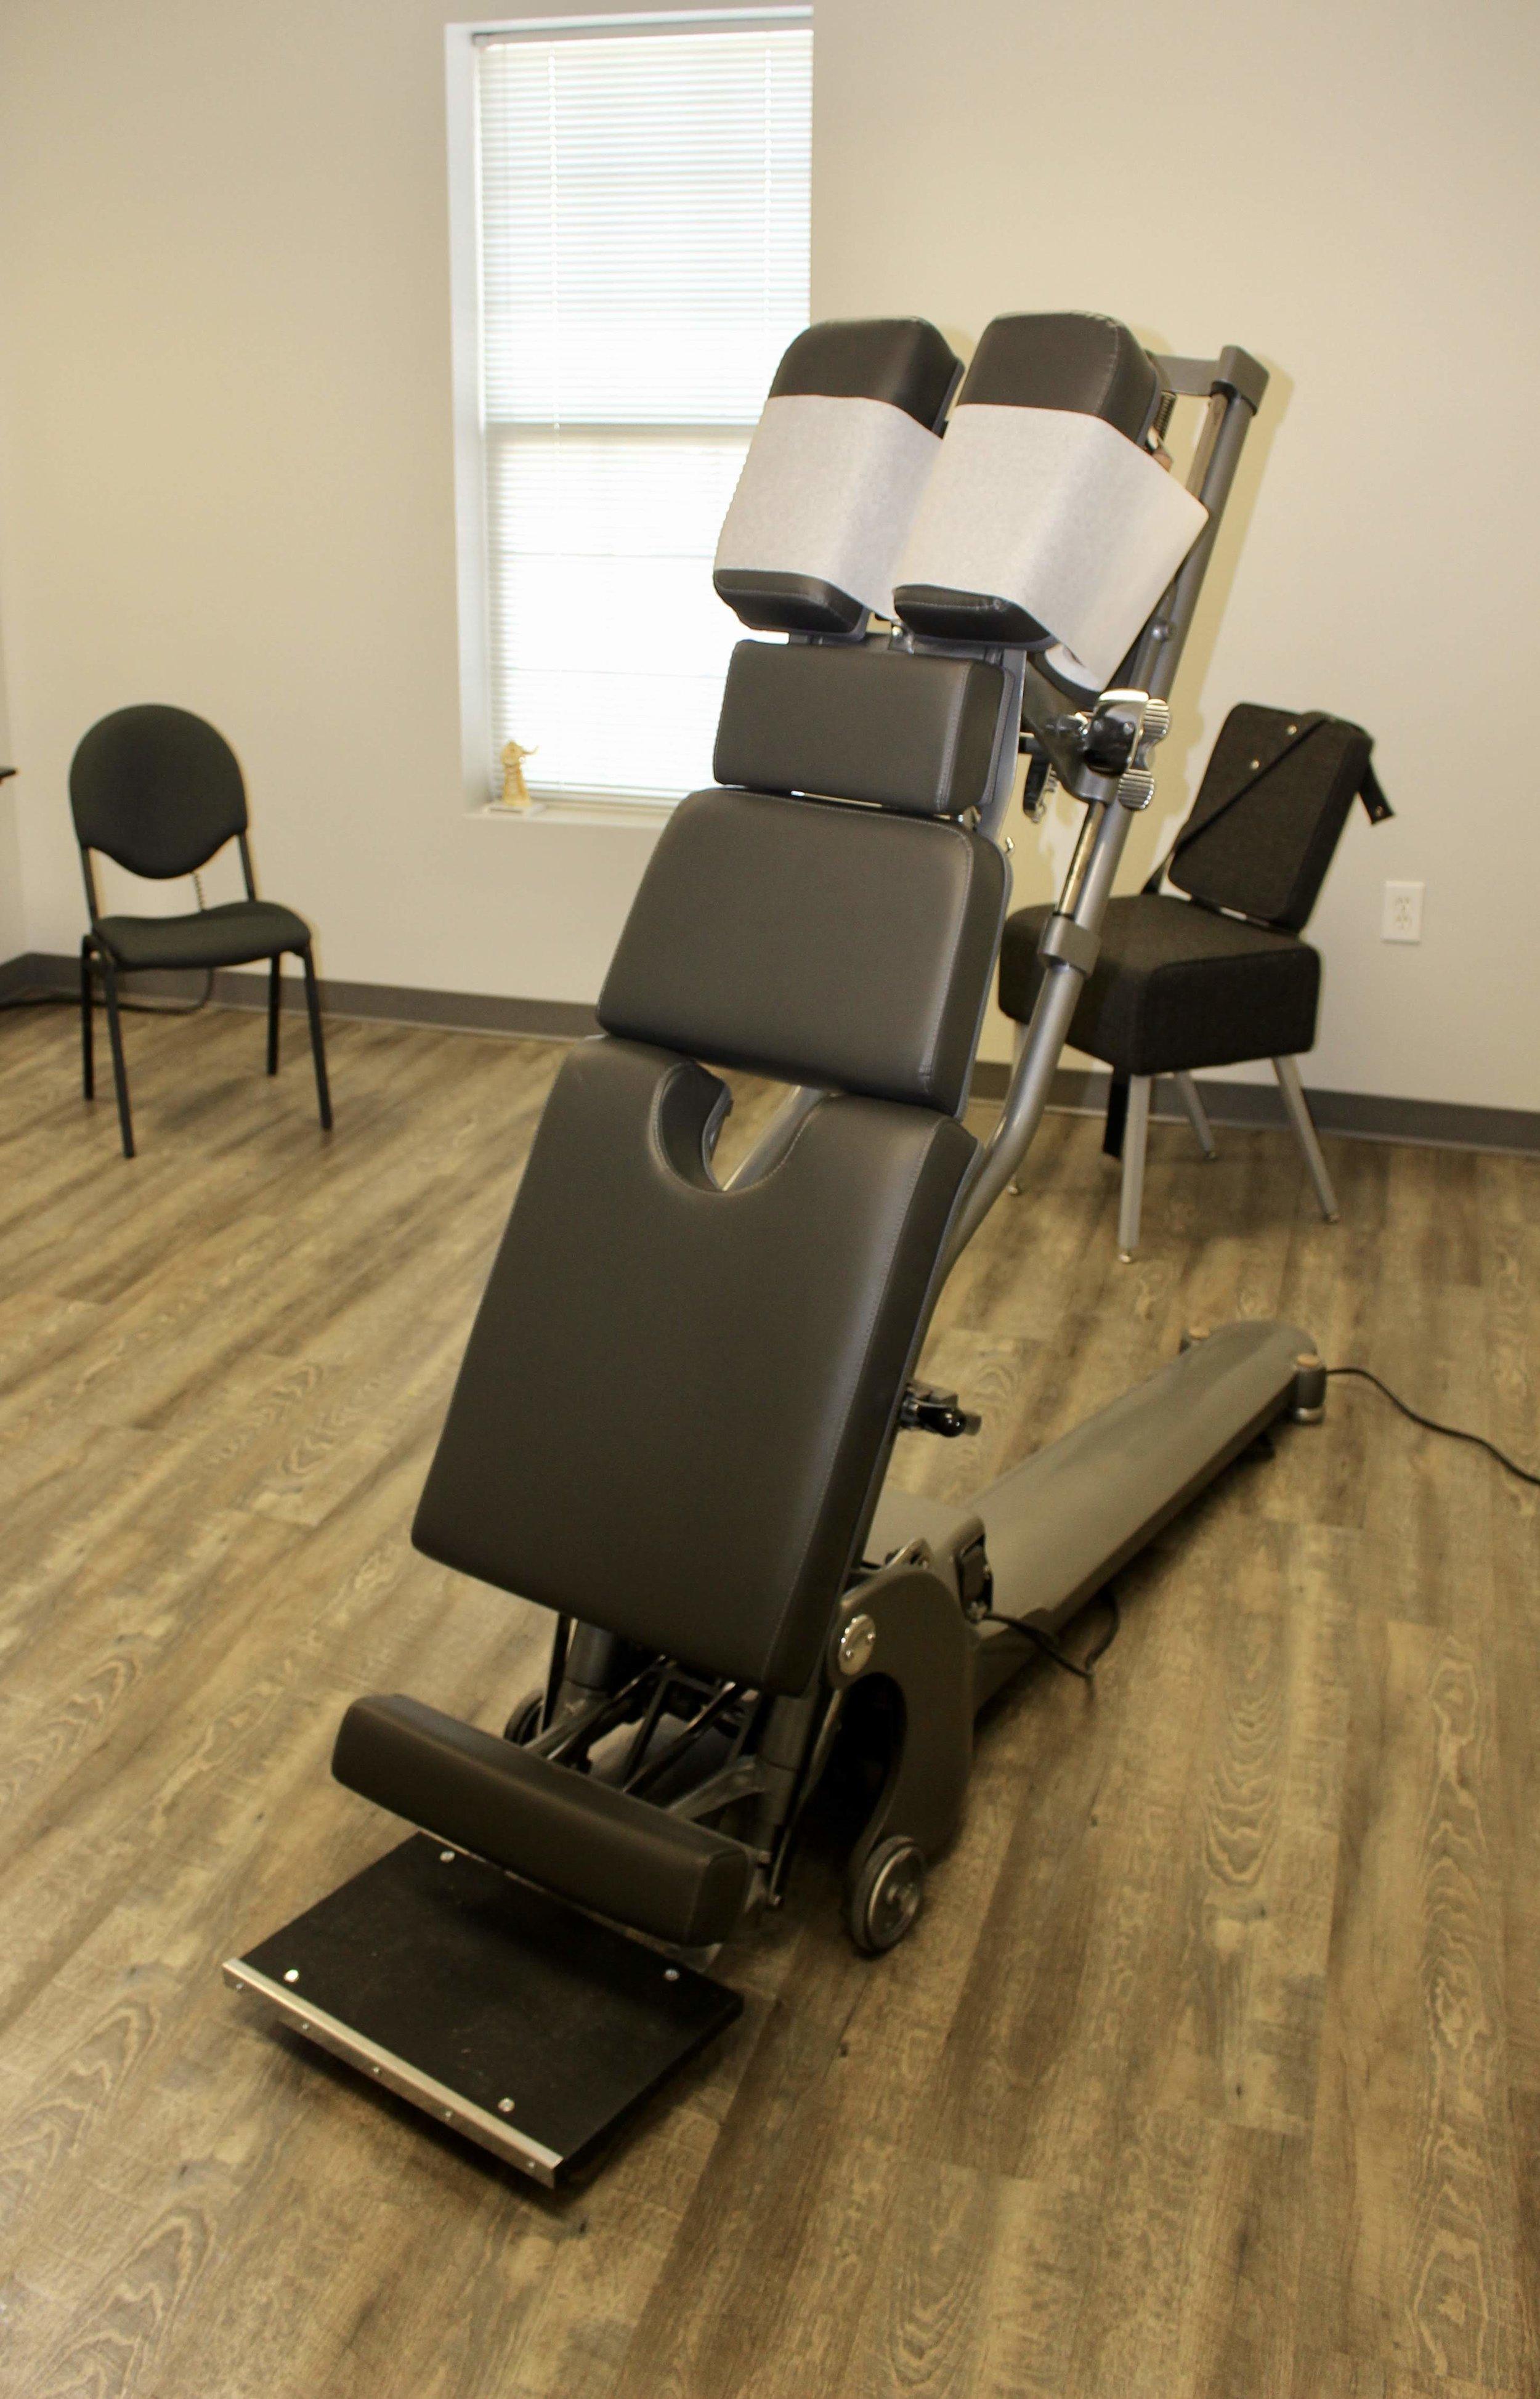 dhillon-chiropractic-equipment.jpeg